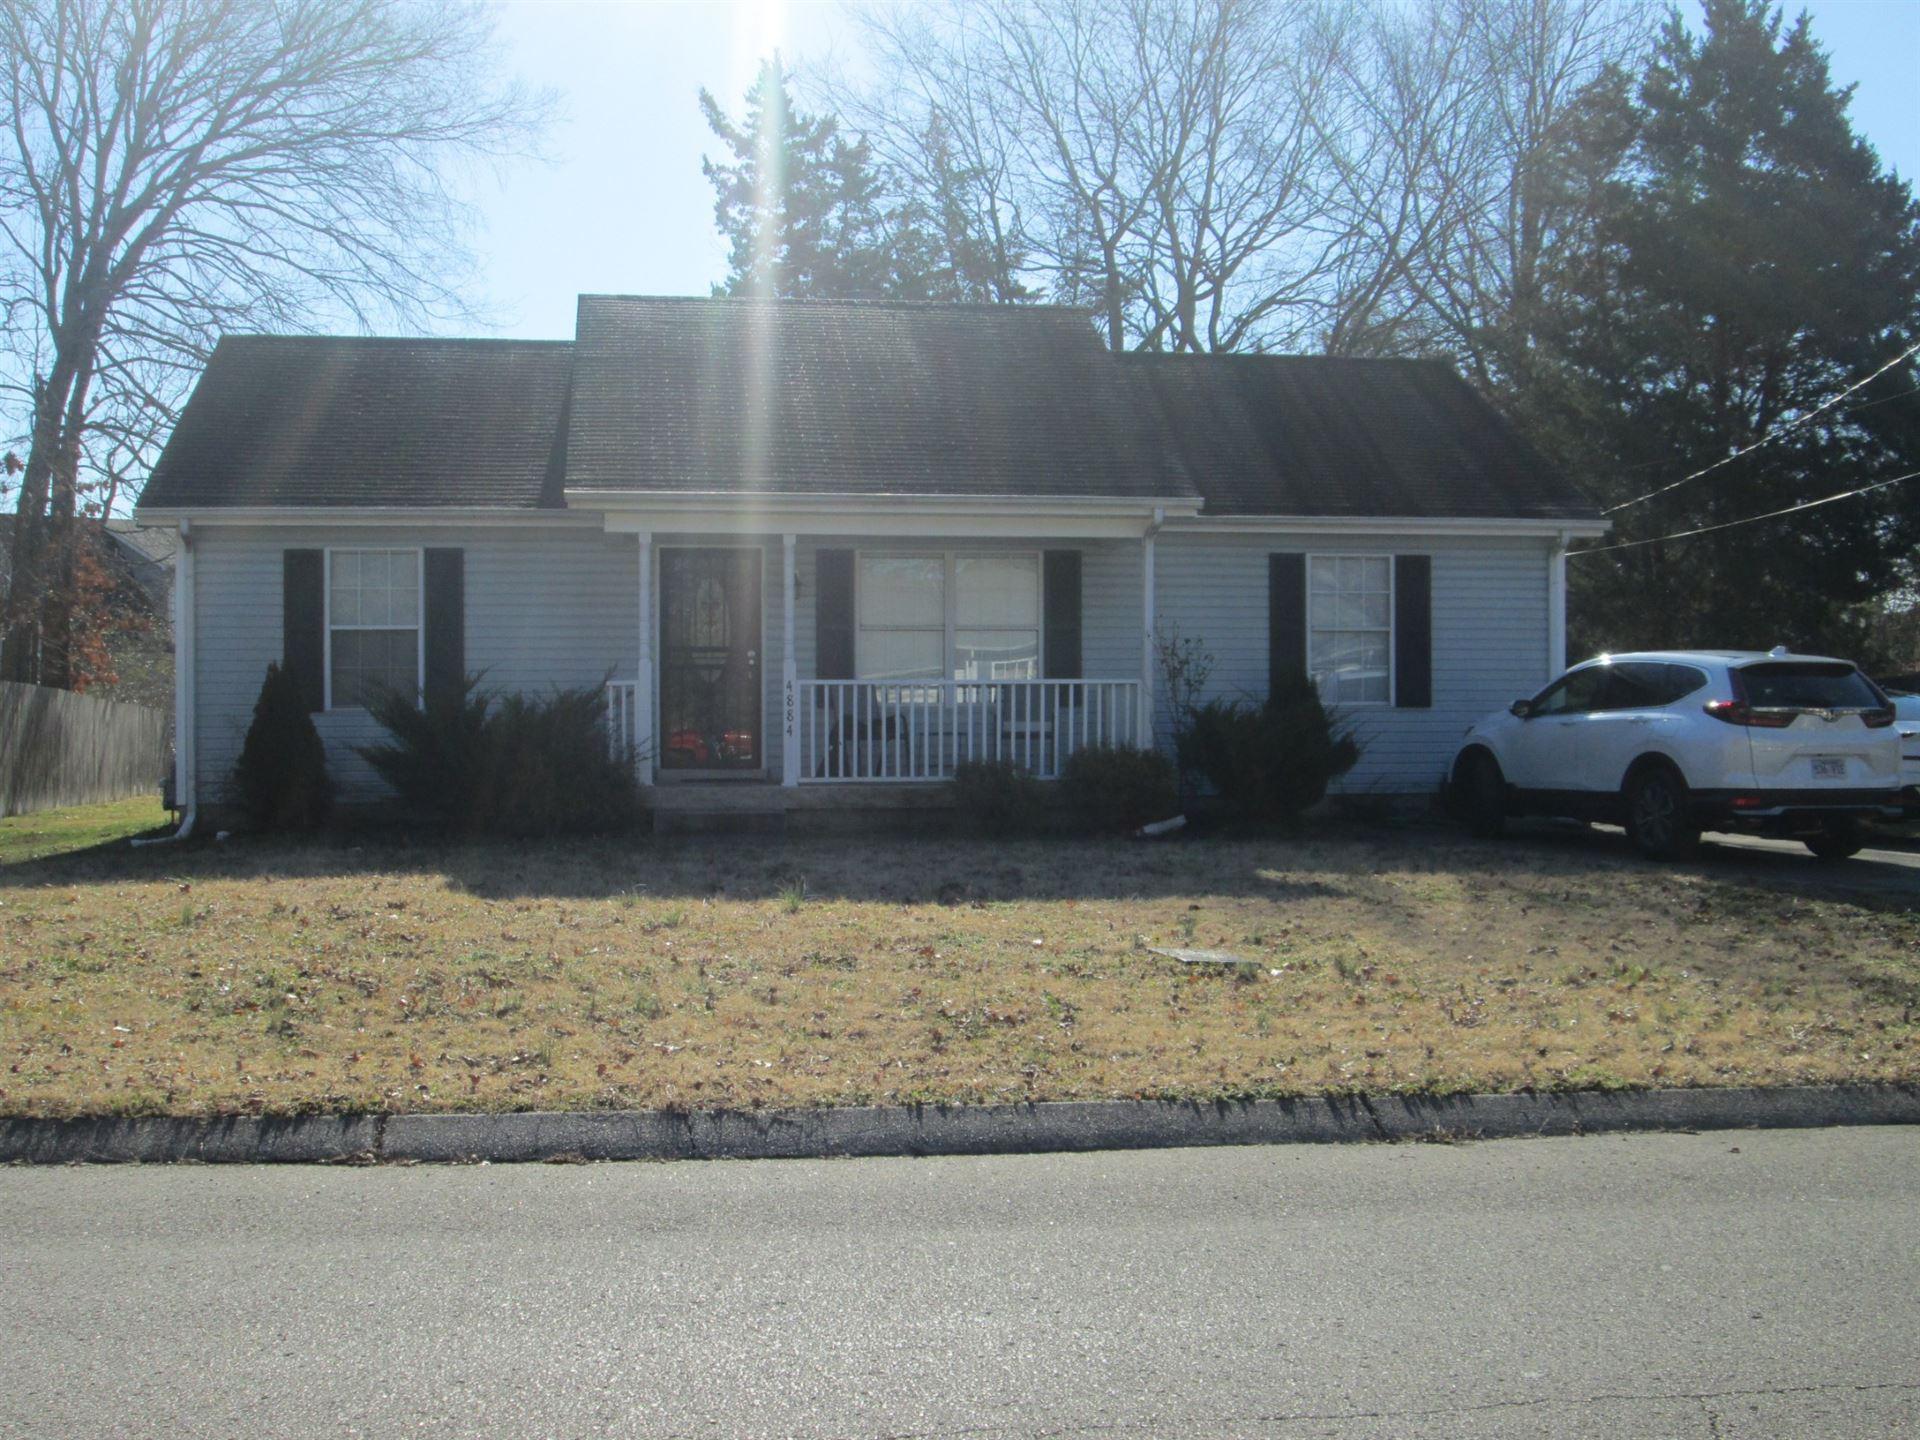 4884 Peppertree Dr, Antioch, TN 37013 - MLS#: 2222815